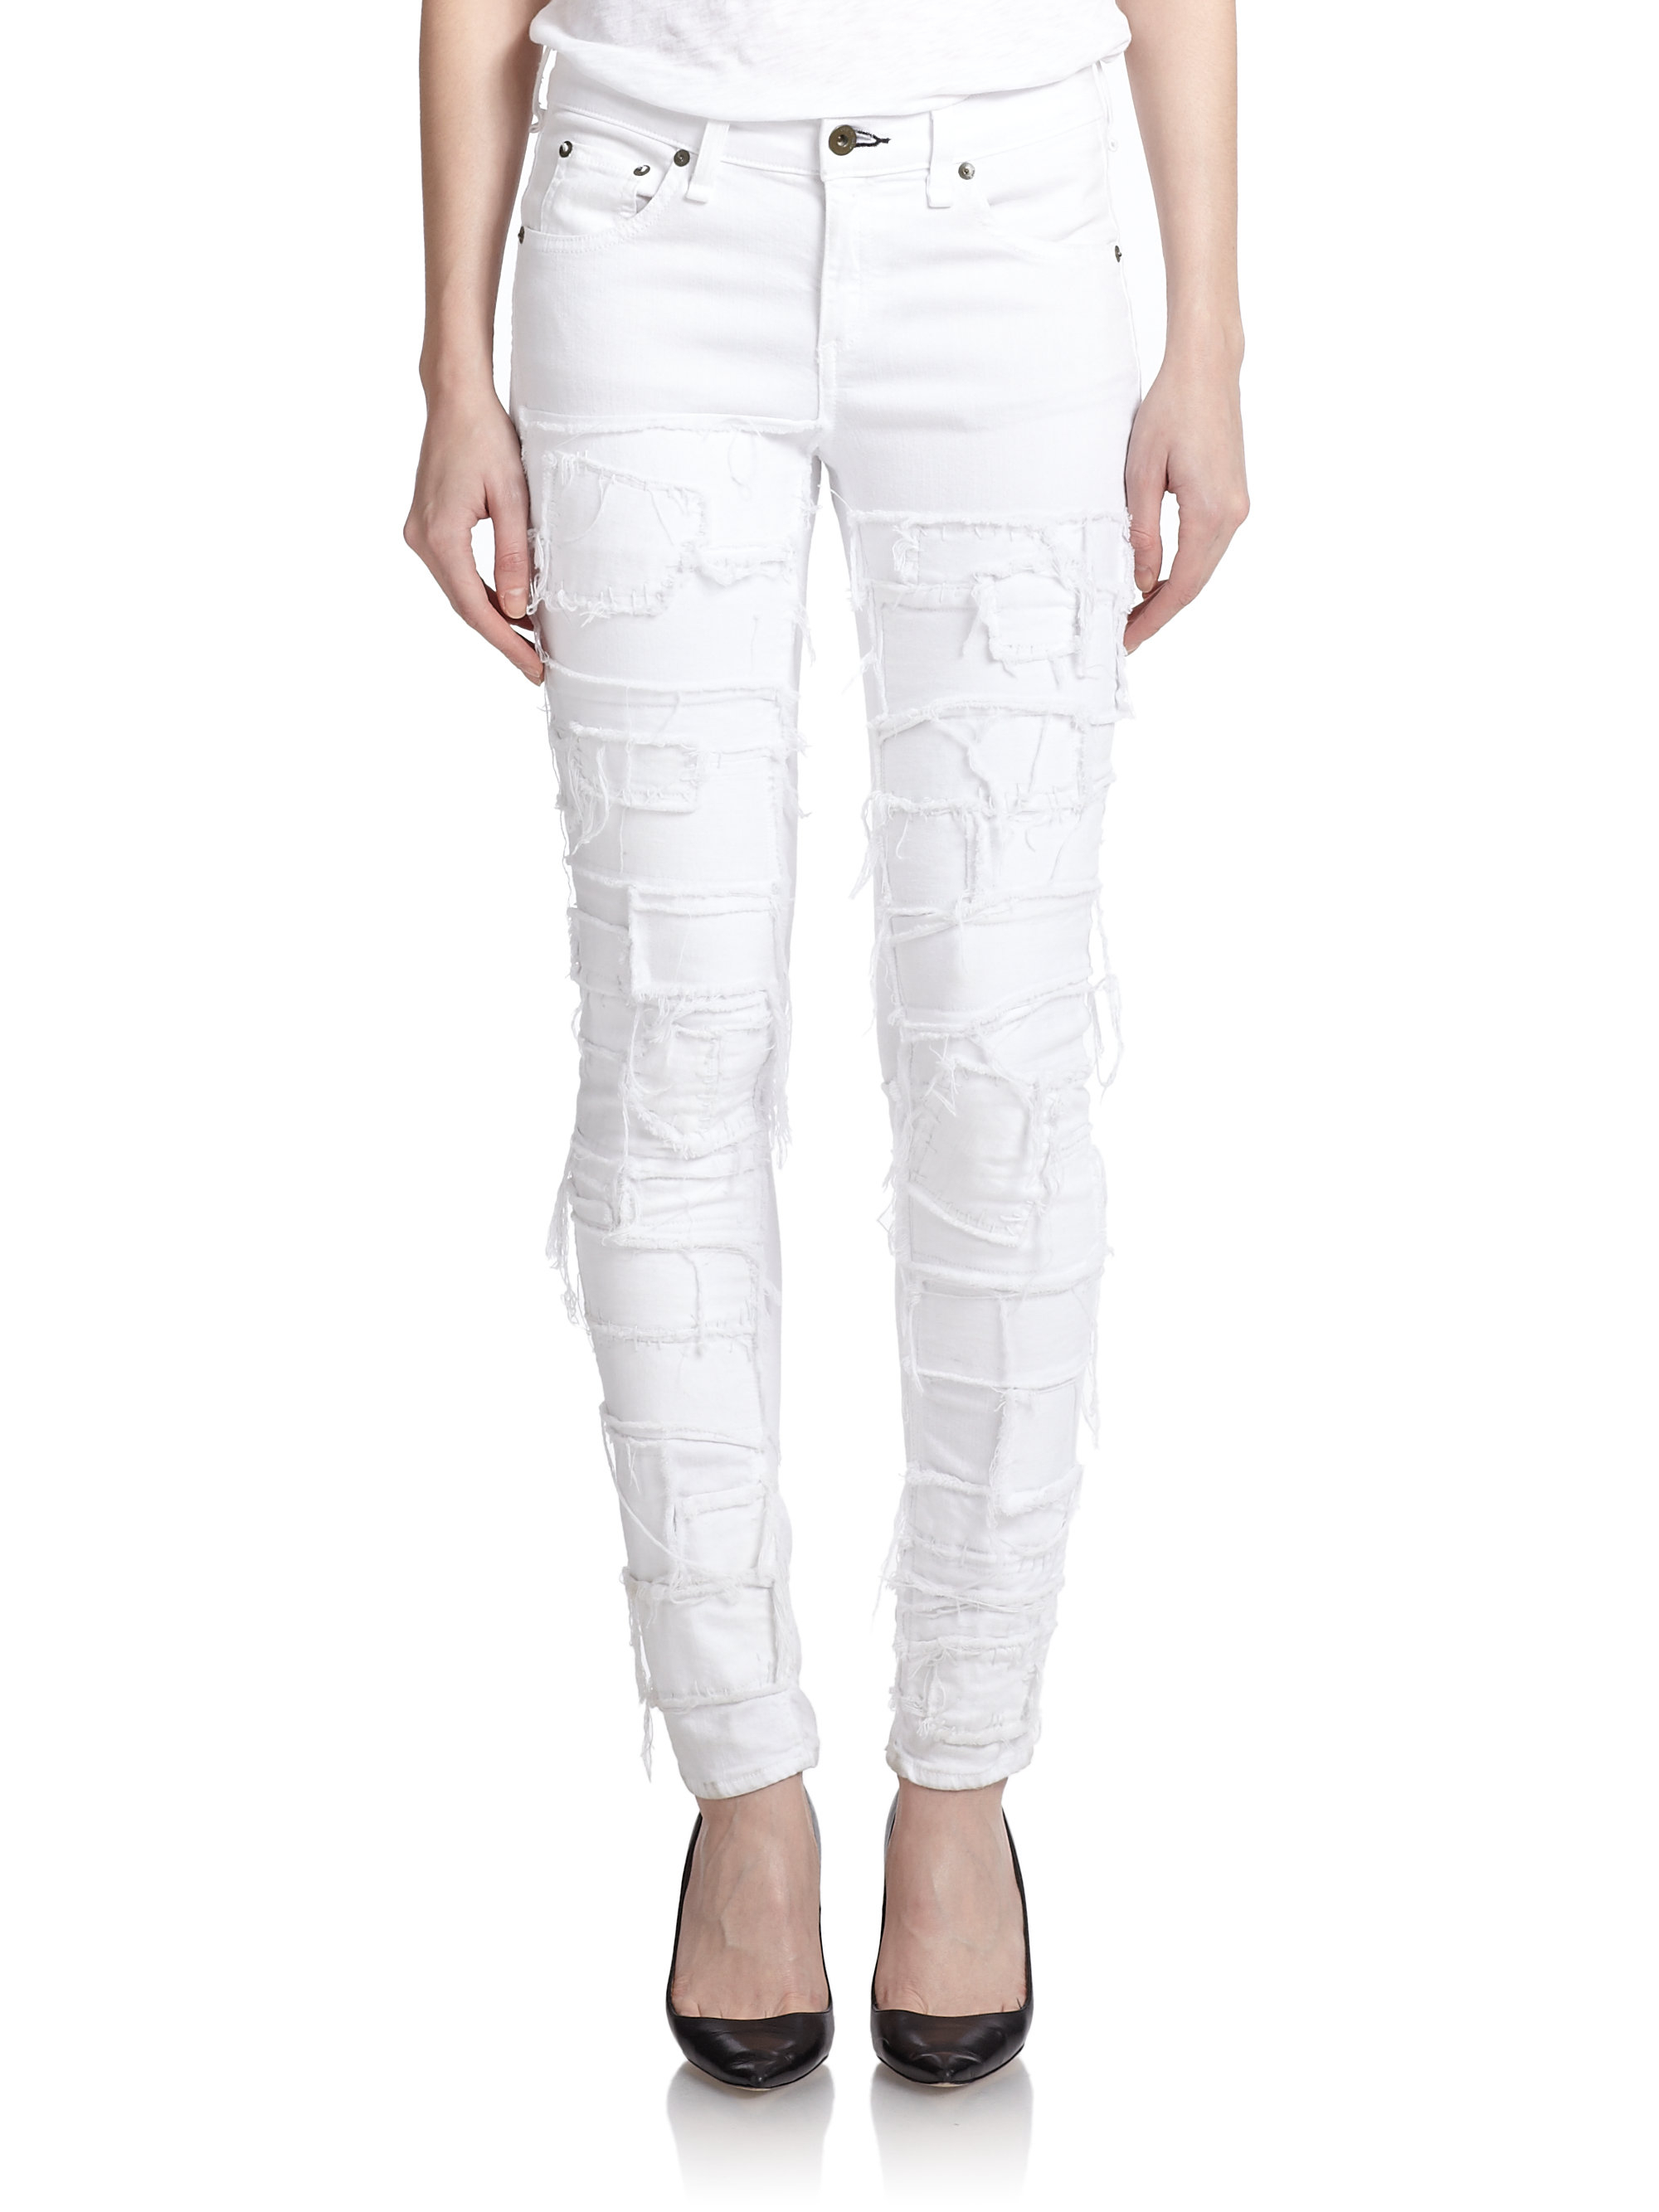 Lyst - Rag & Bone Distressed Skinny Jeans in White